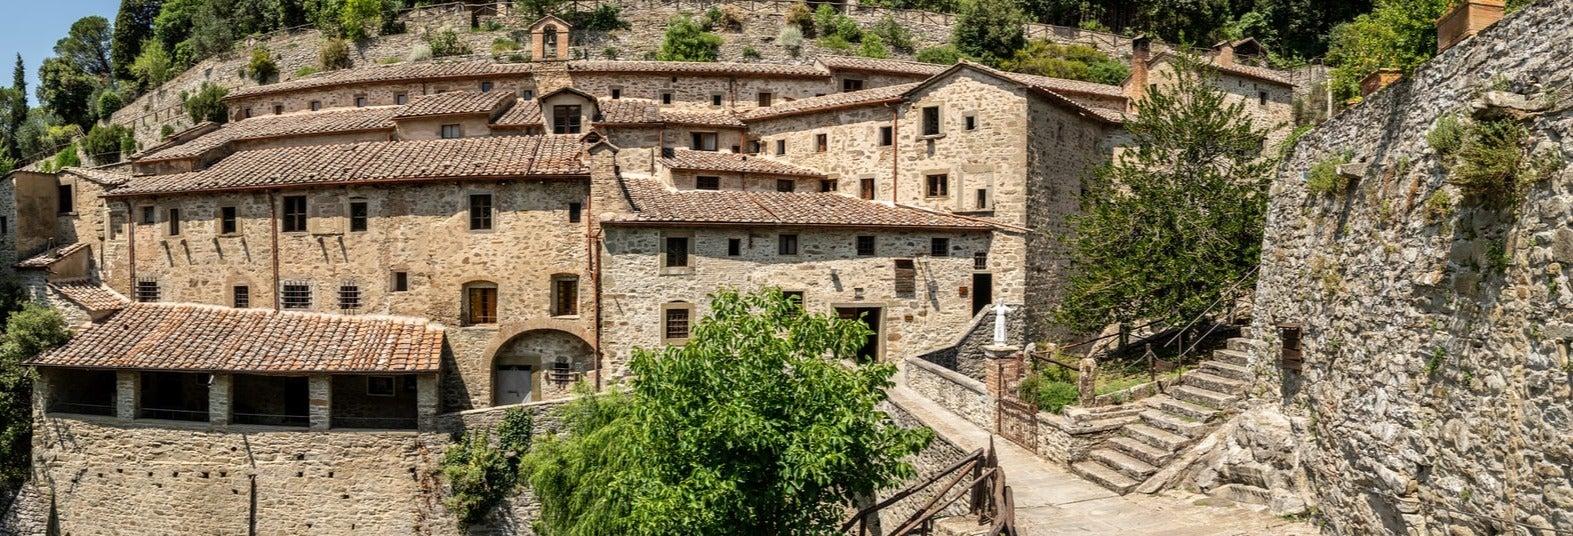 Tour privado por Cortona con guía en español